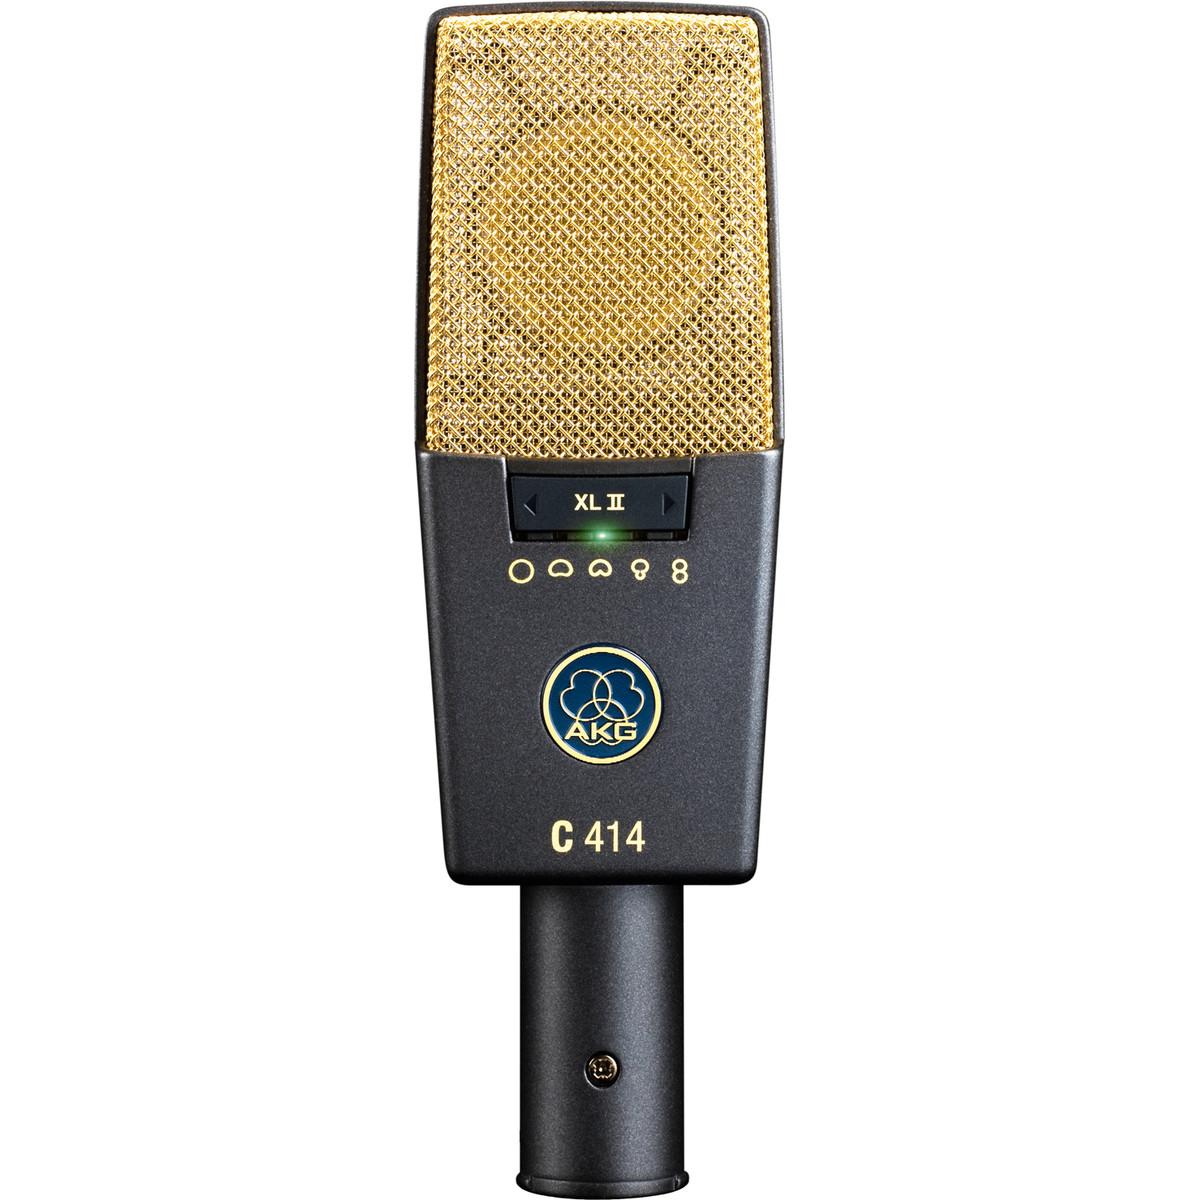 Image of AKG C414XL II Condenser Microphone